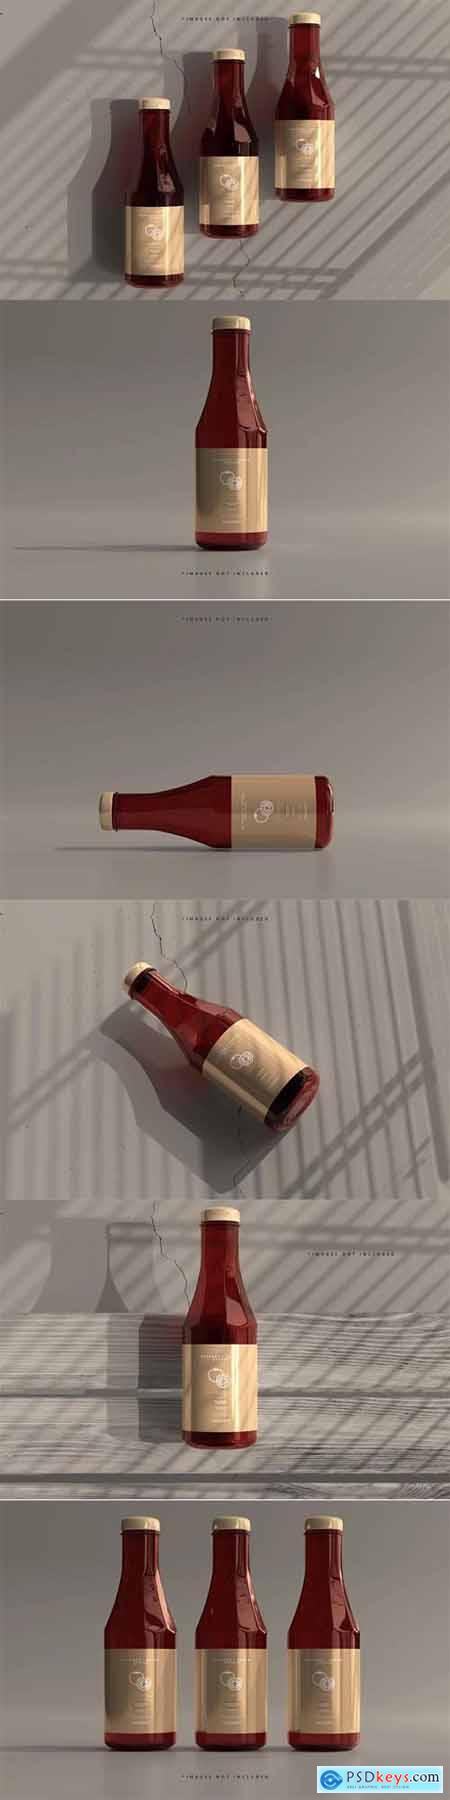 Ketchup or sauce bottles mockup 2